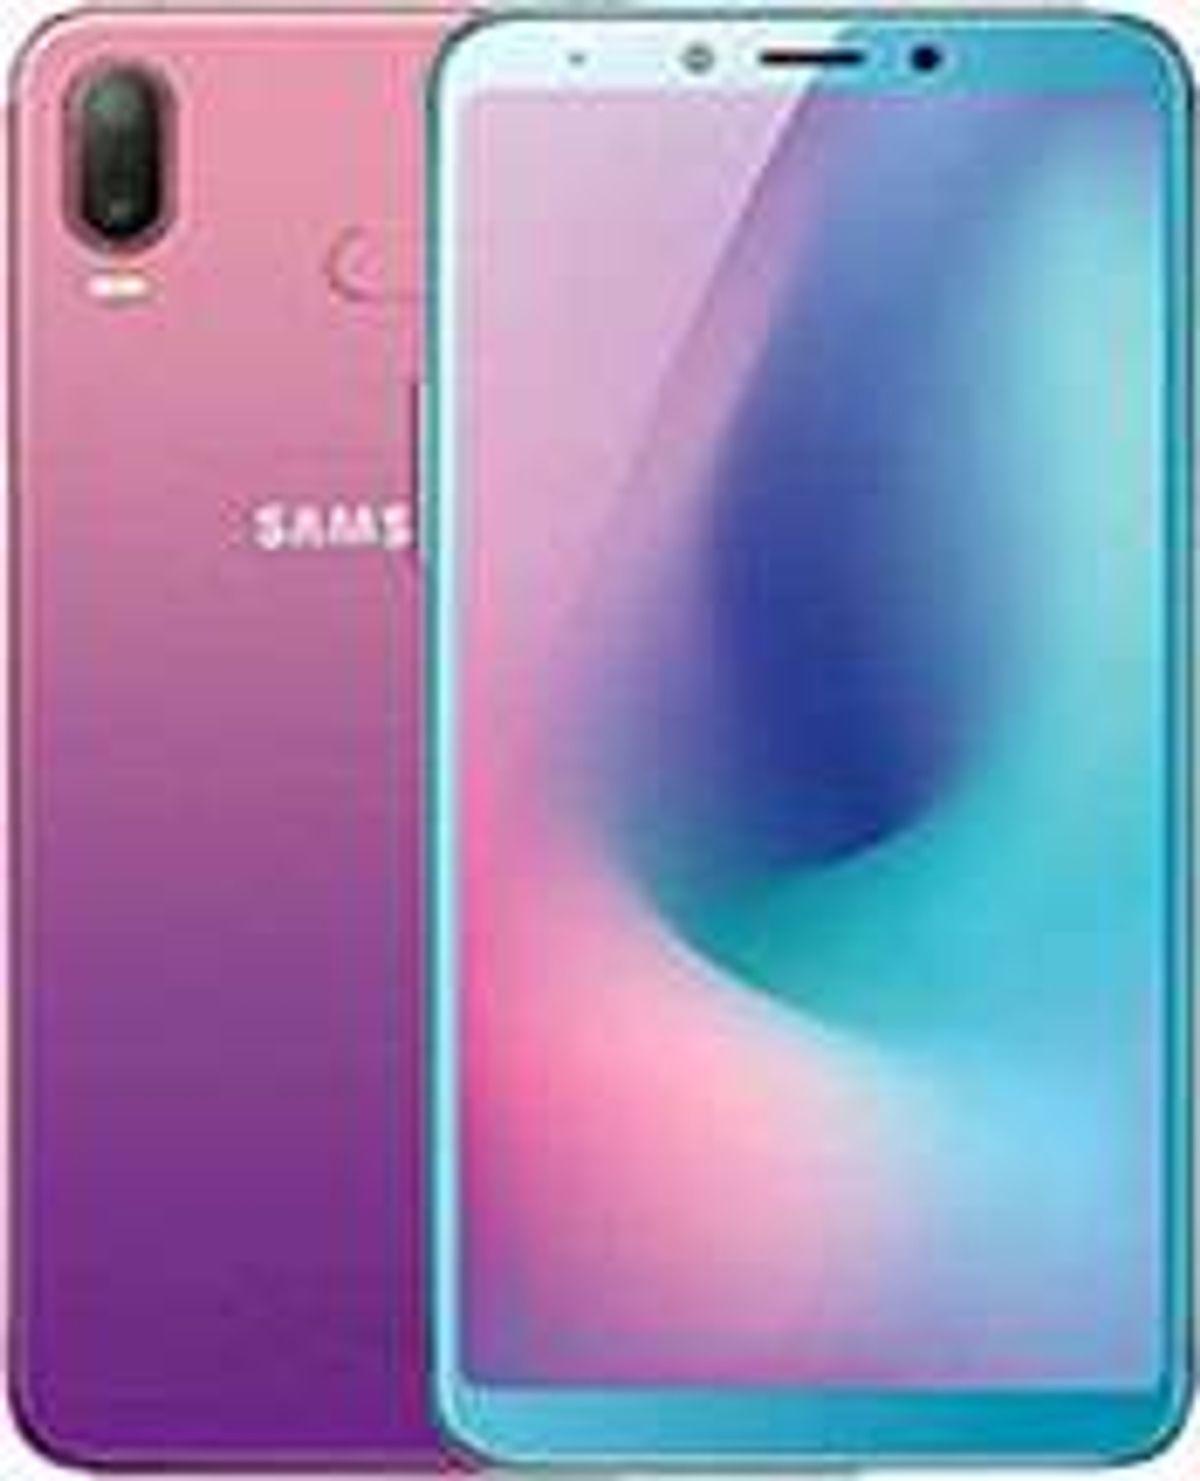 Best 128 GB Internal Memory Mobiles Phones in India - August 2019